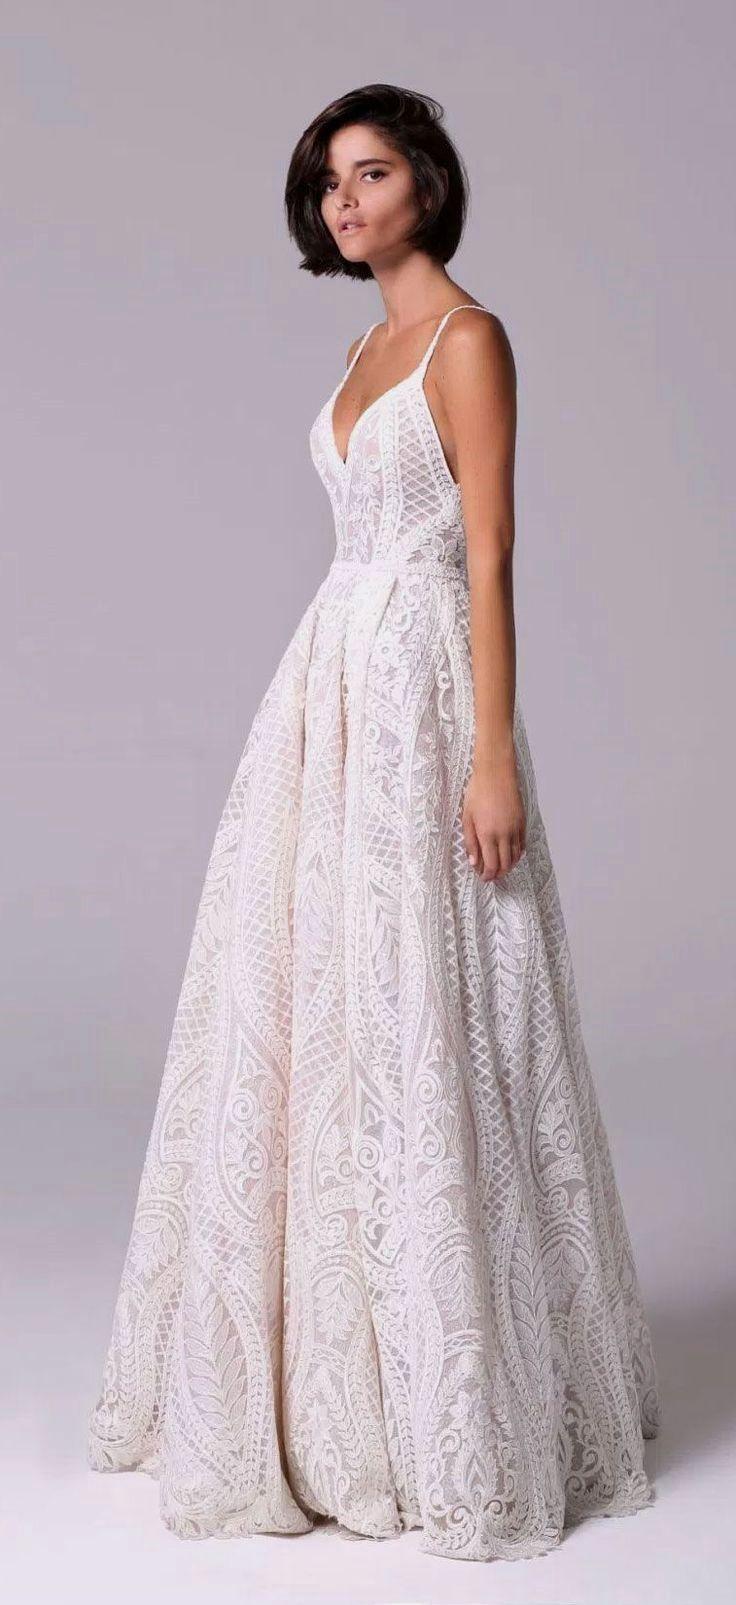 White bride dresses brides imagine finding the most appropriate